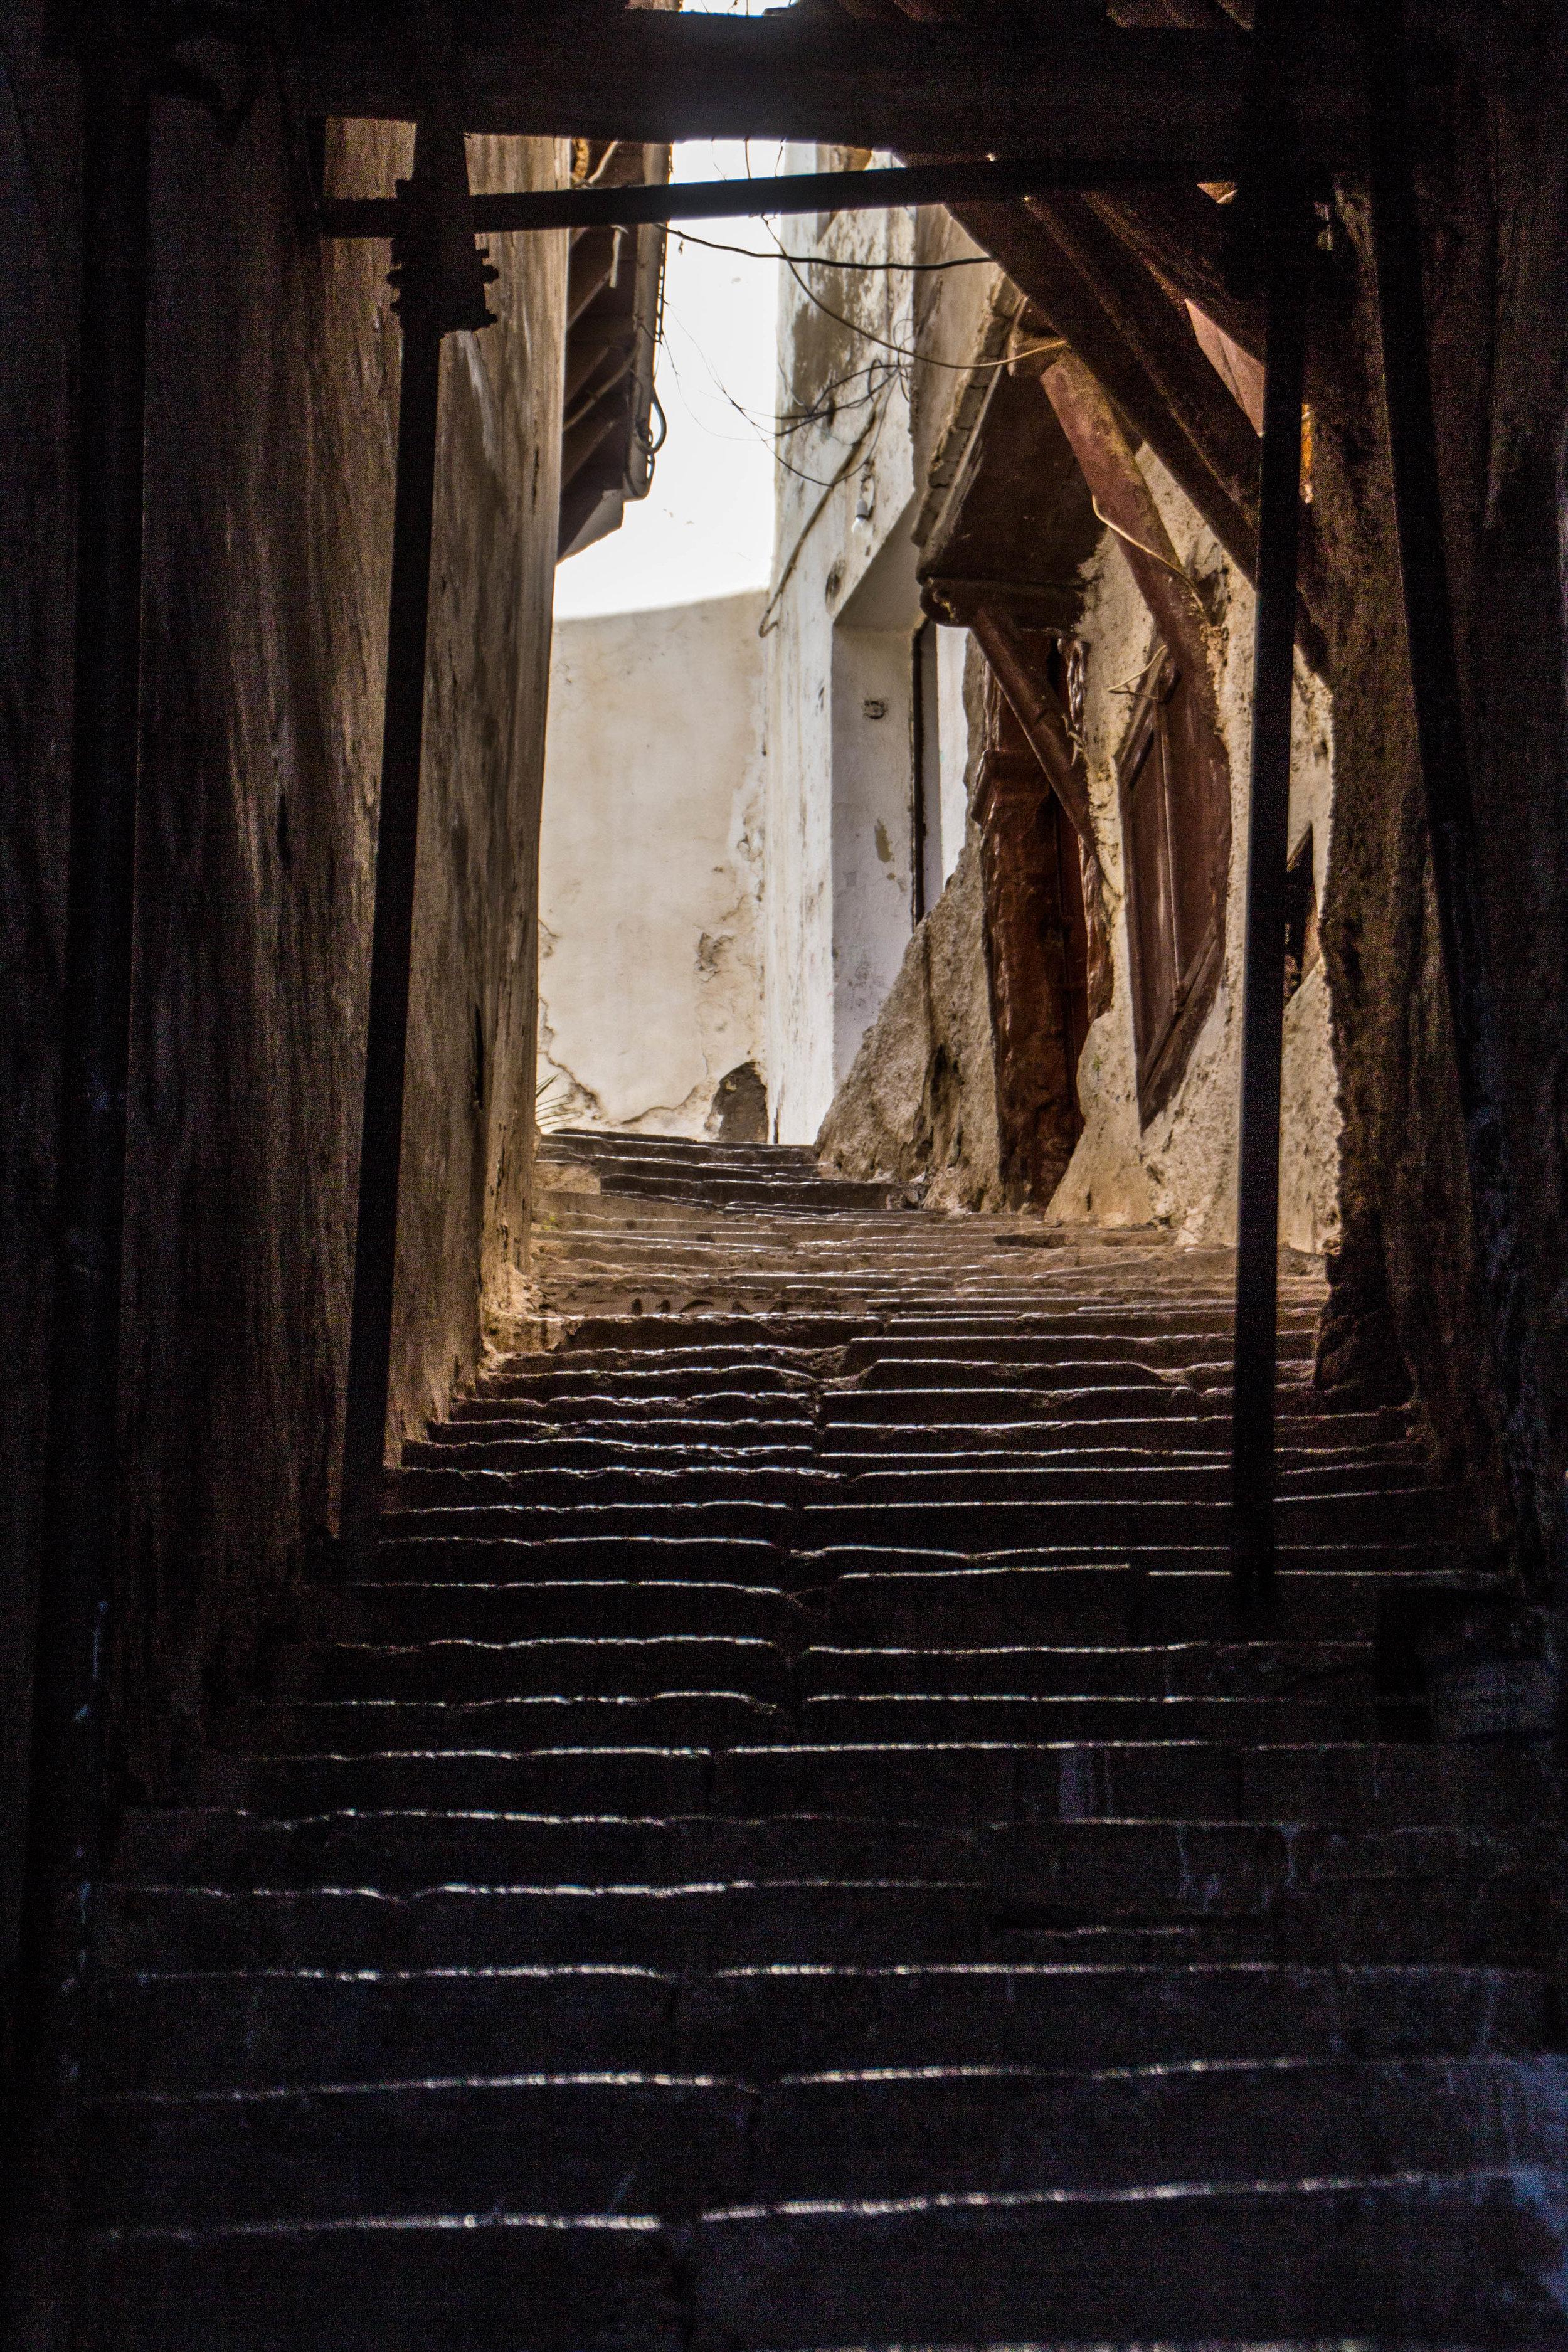 casbah-photography-algiers-algeria-alger-63.jpg